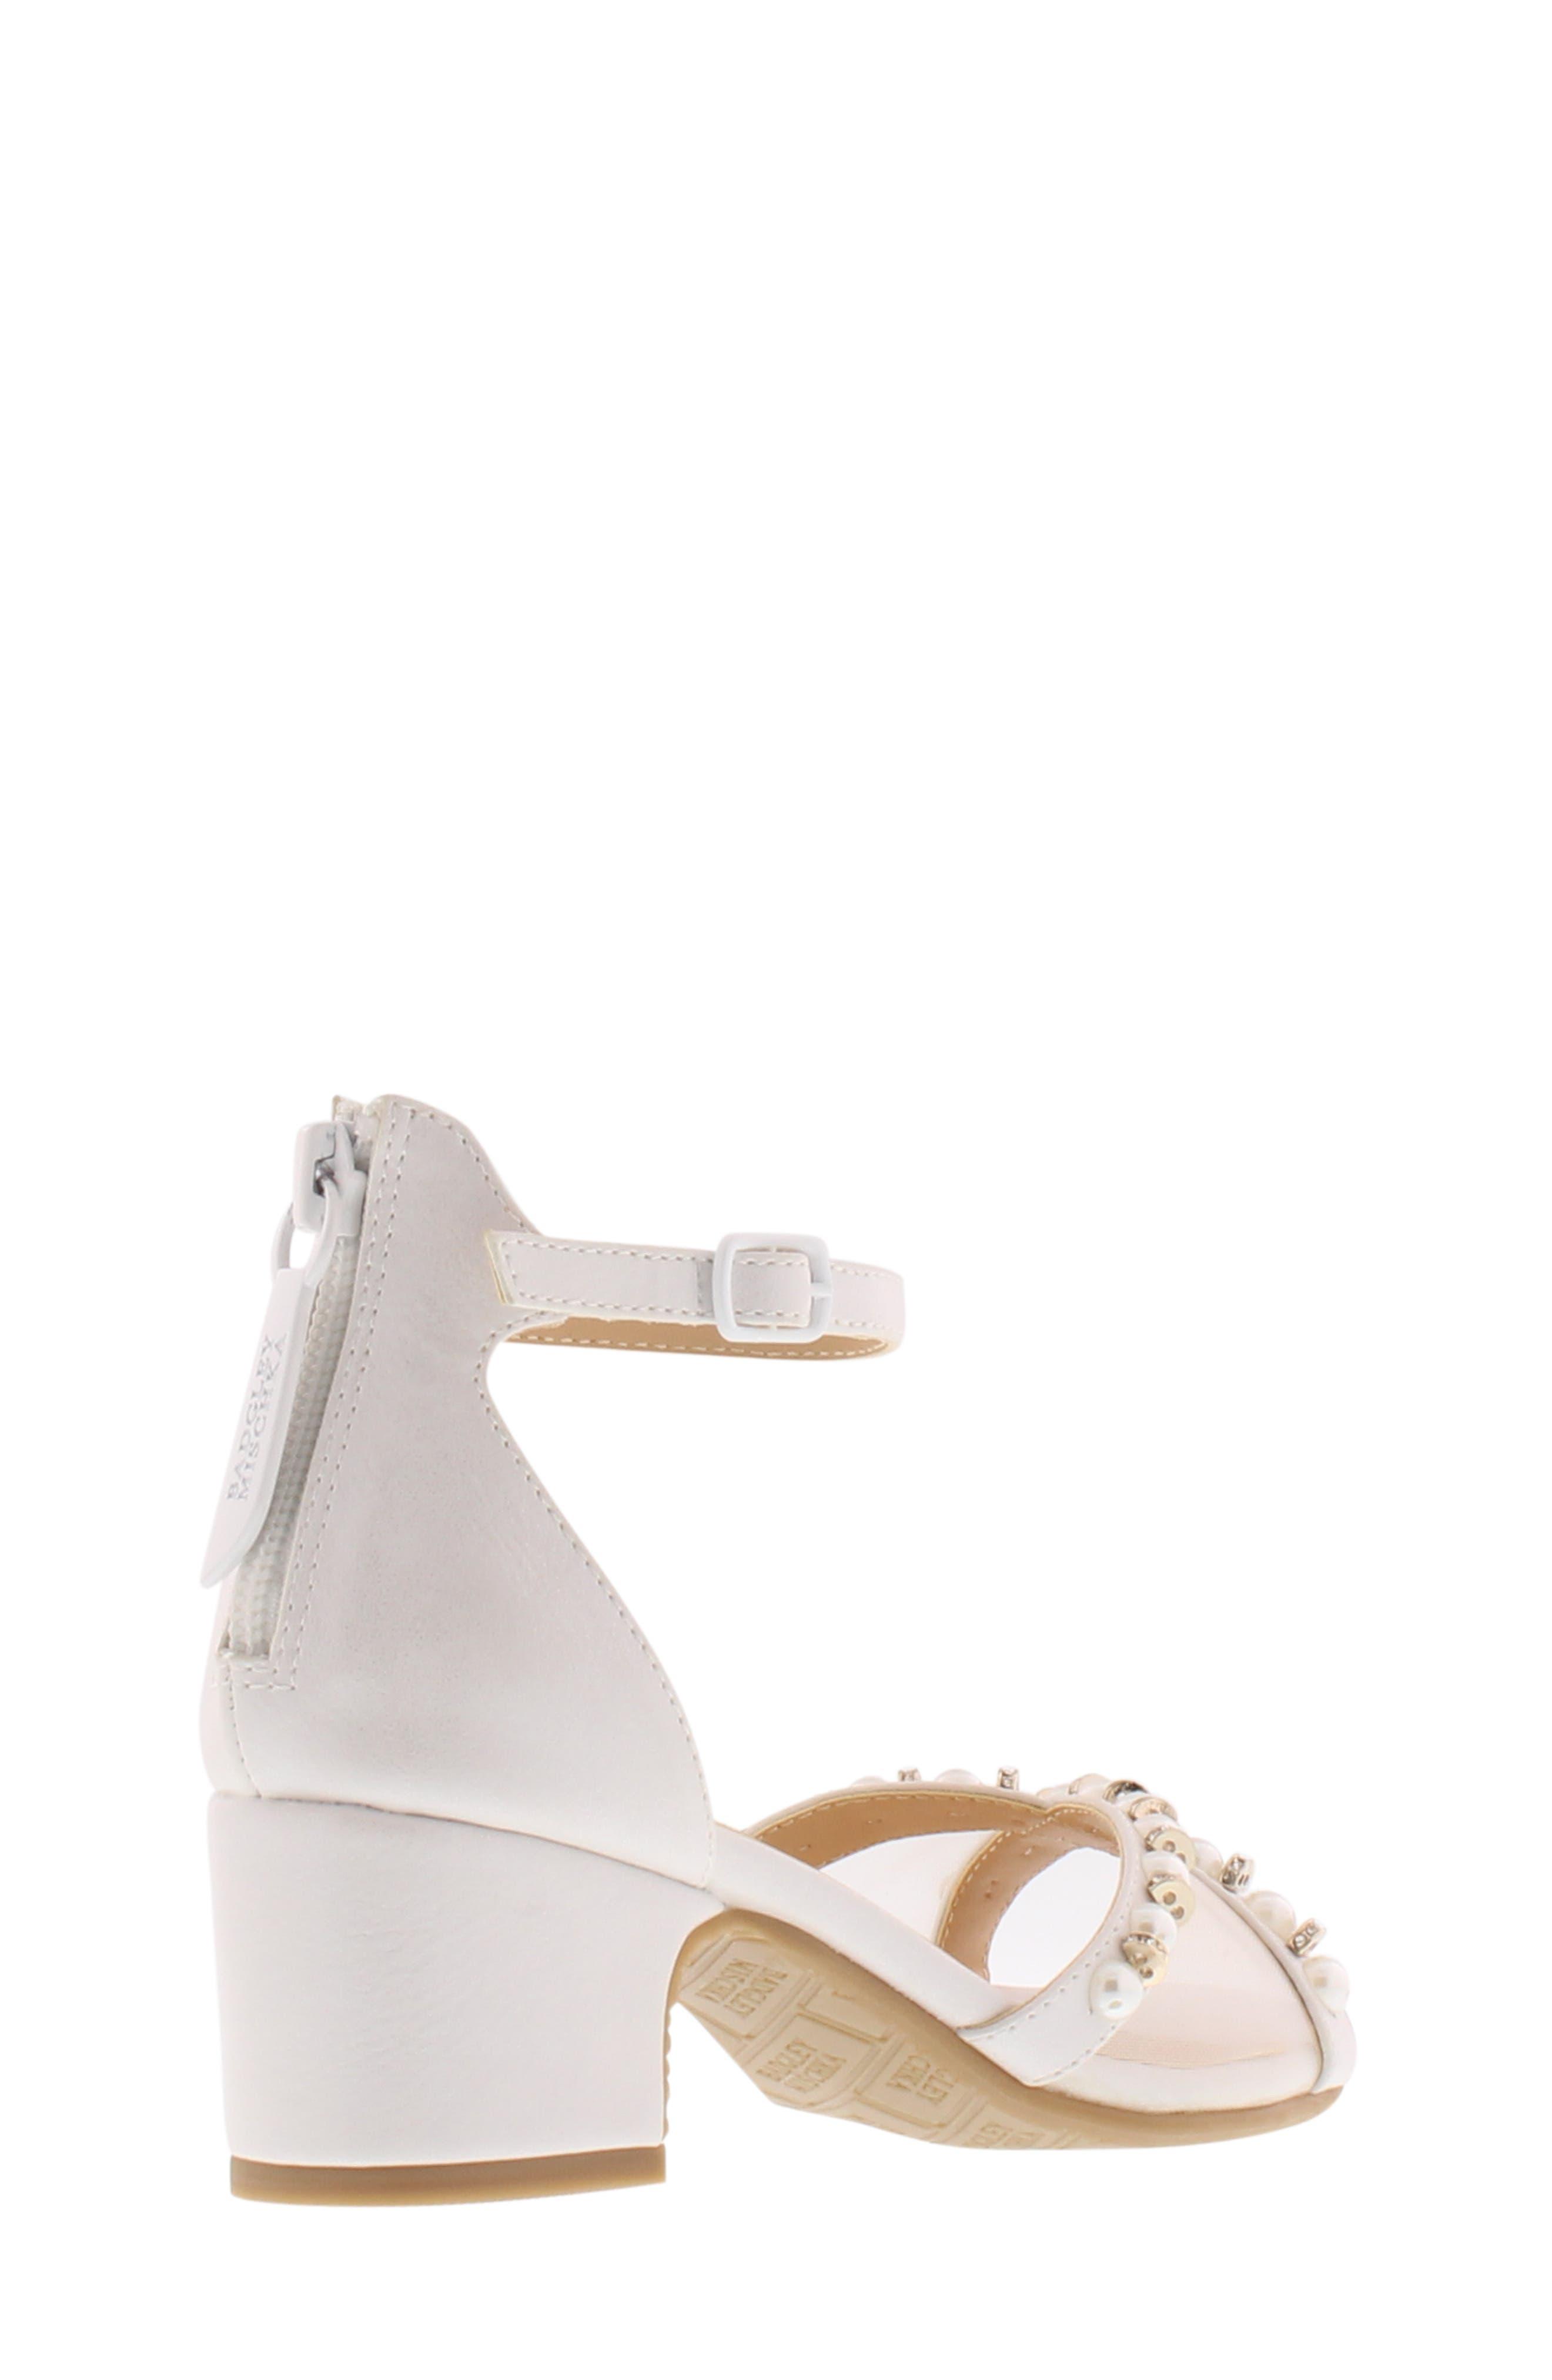 BADGLEY MISCHKA COLLECTION,                             Badgley Mischka Pernia Emily Embellished Sandal,                             Alternate thumbnail 2, color,                             WHITE SHIMMER